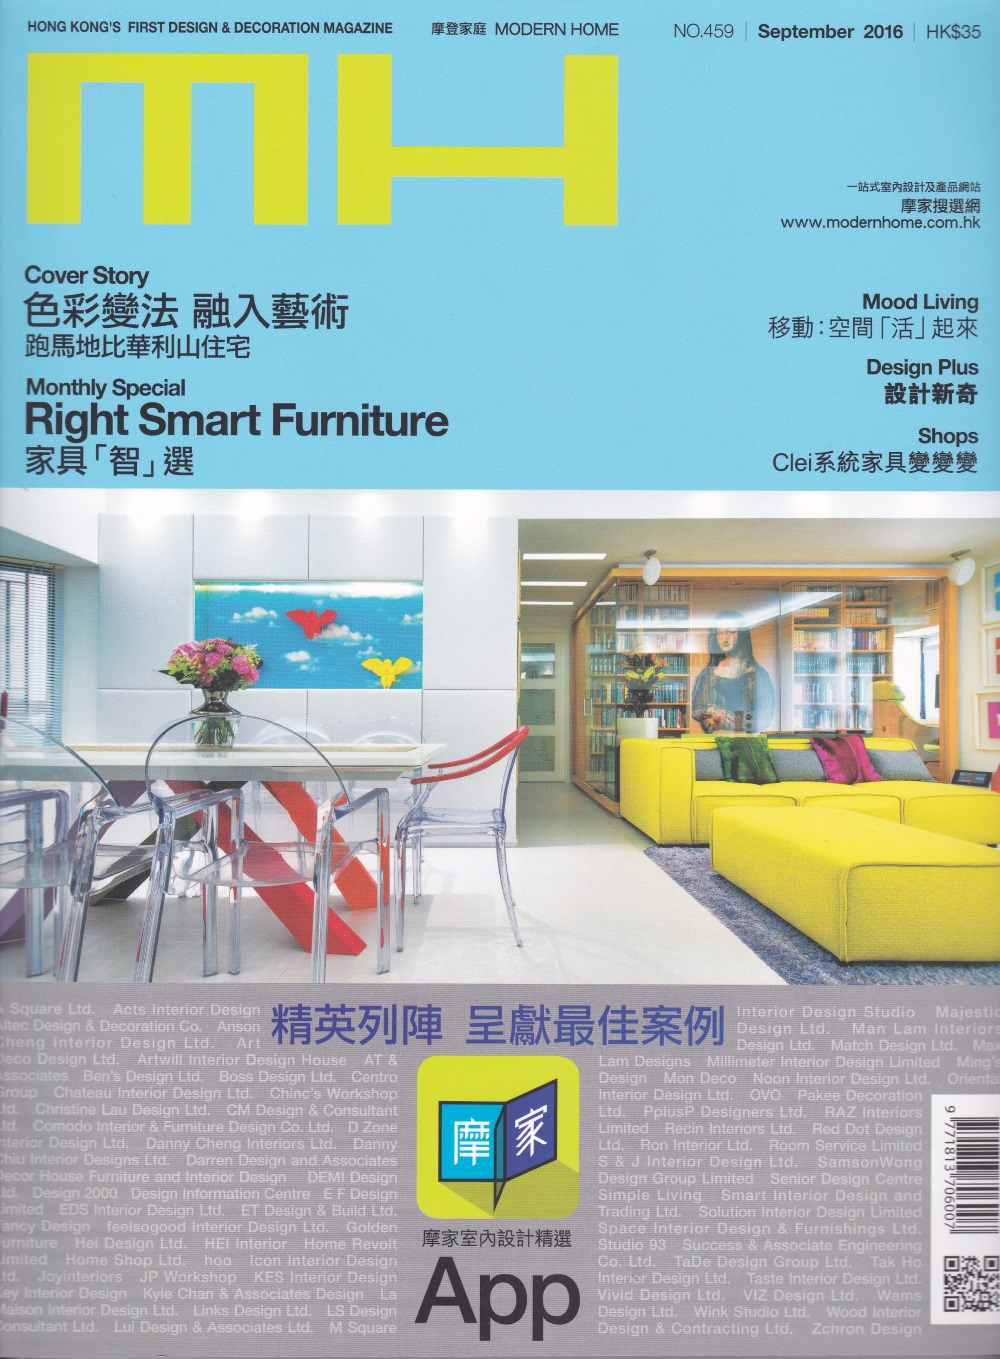 ceiling fan, award winning ceiling fans | elar group - products